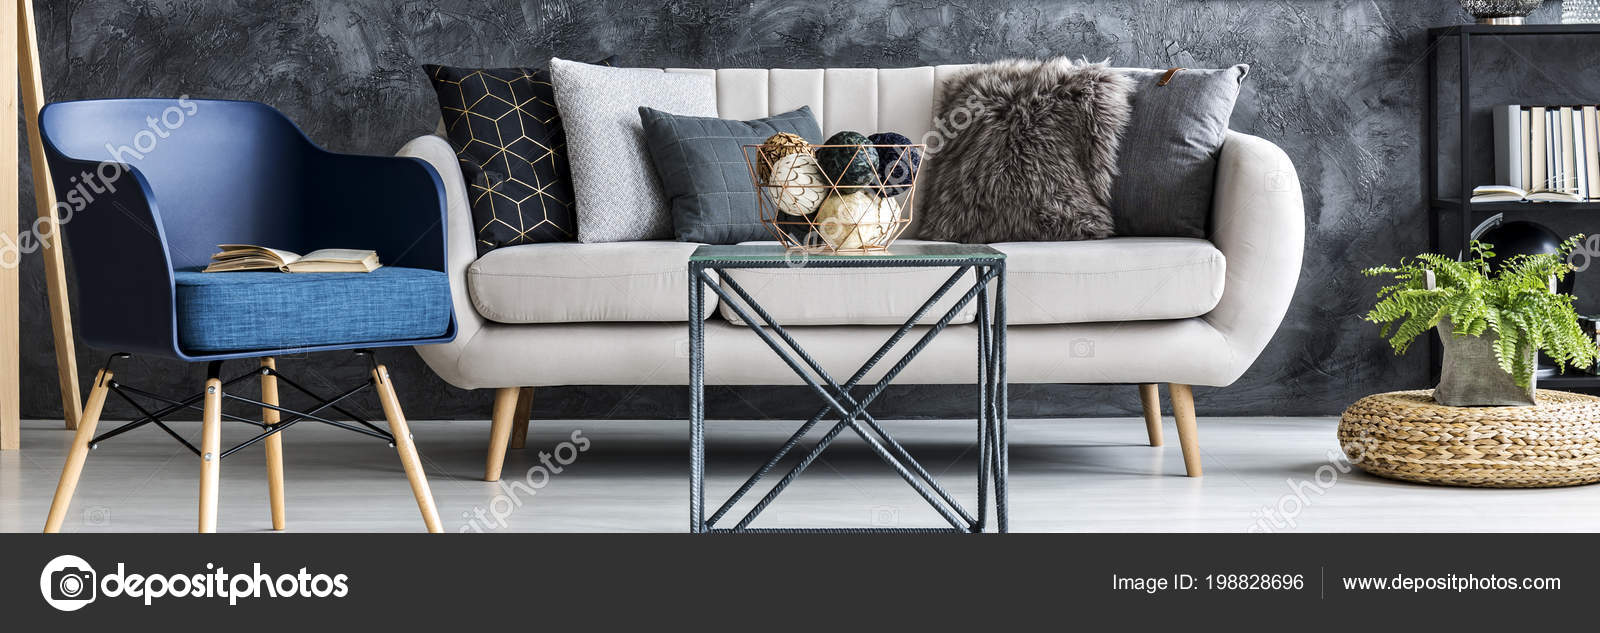 Image of: Light Grey Sofa Decorative Pillows Standing Dark Living Room Interior Stock Photo C Photographee Eu 198828696